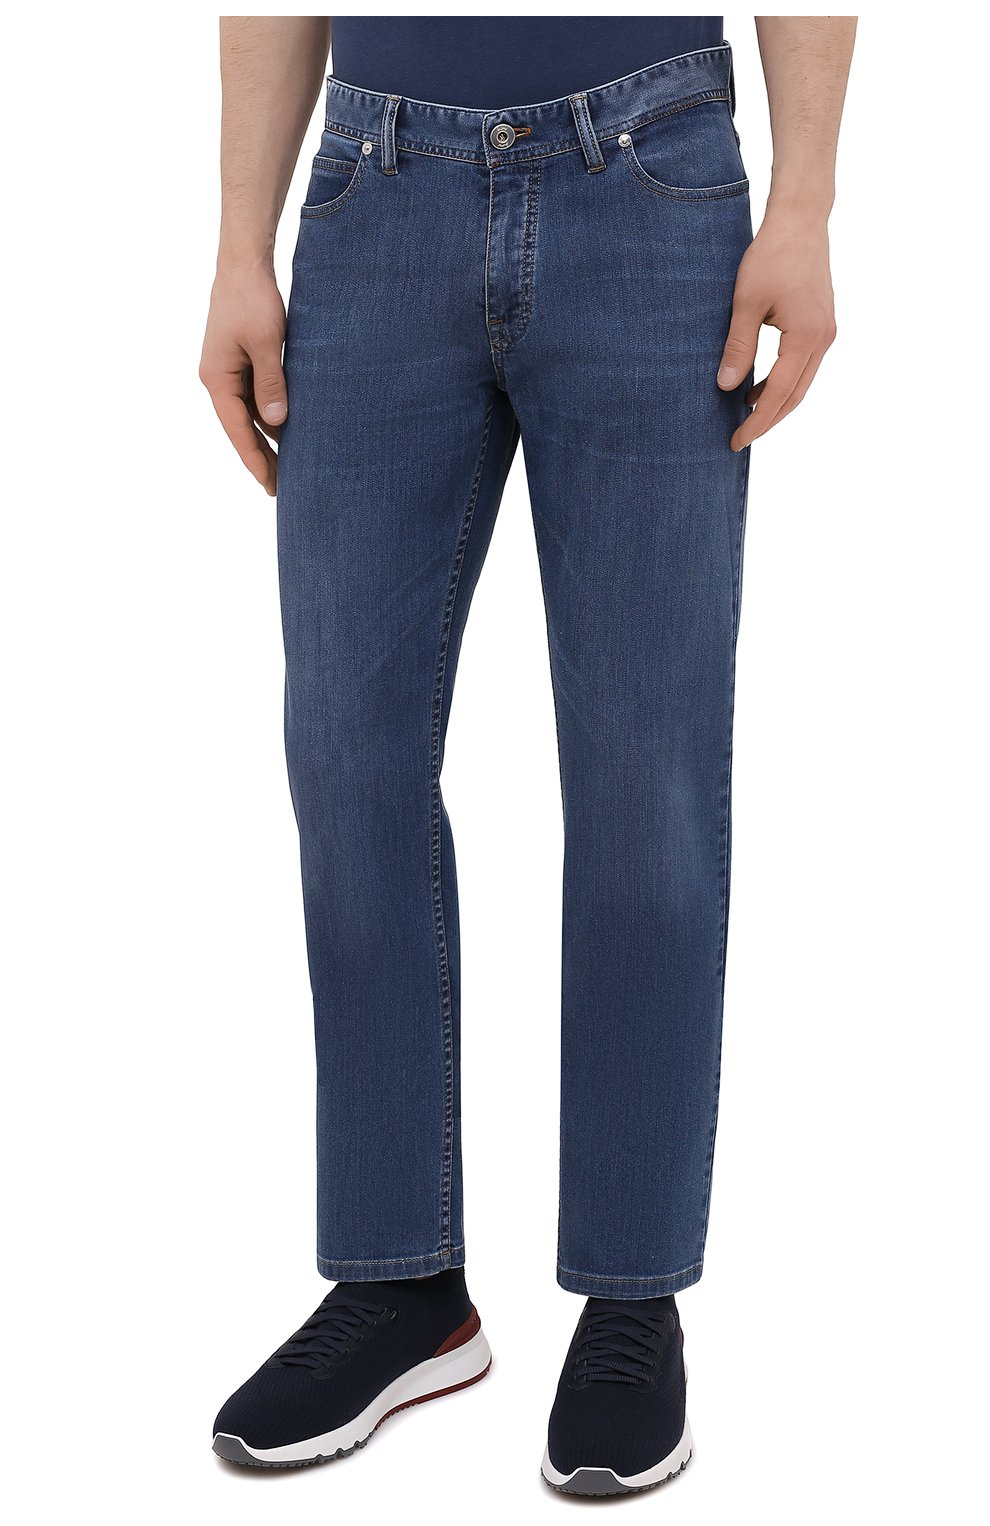 Мужские джинсы BRIONI синего цвета, арт. SPPB0M/P0D06/MERIBEL   Фото 3